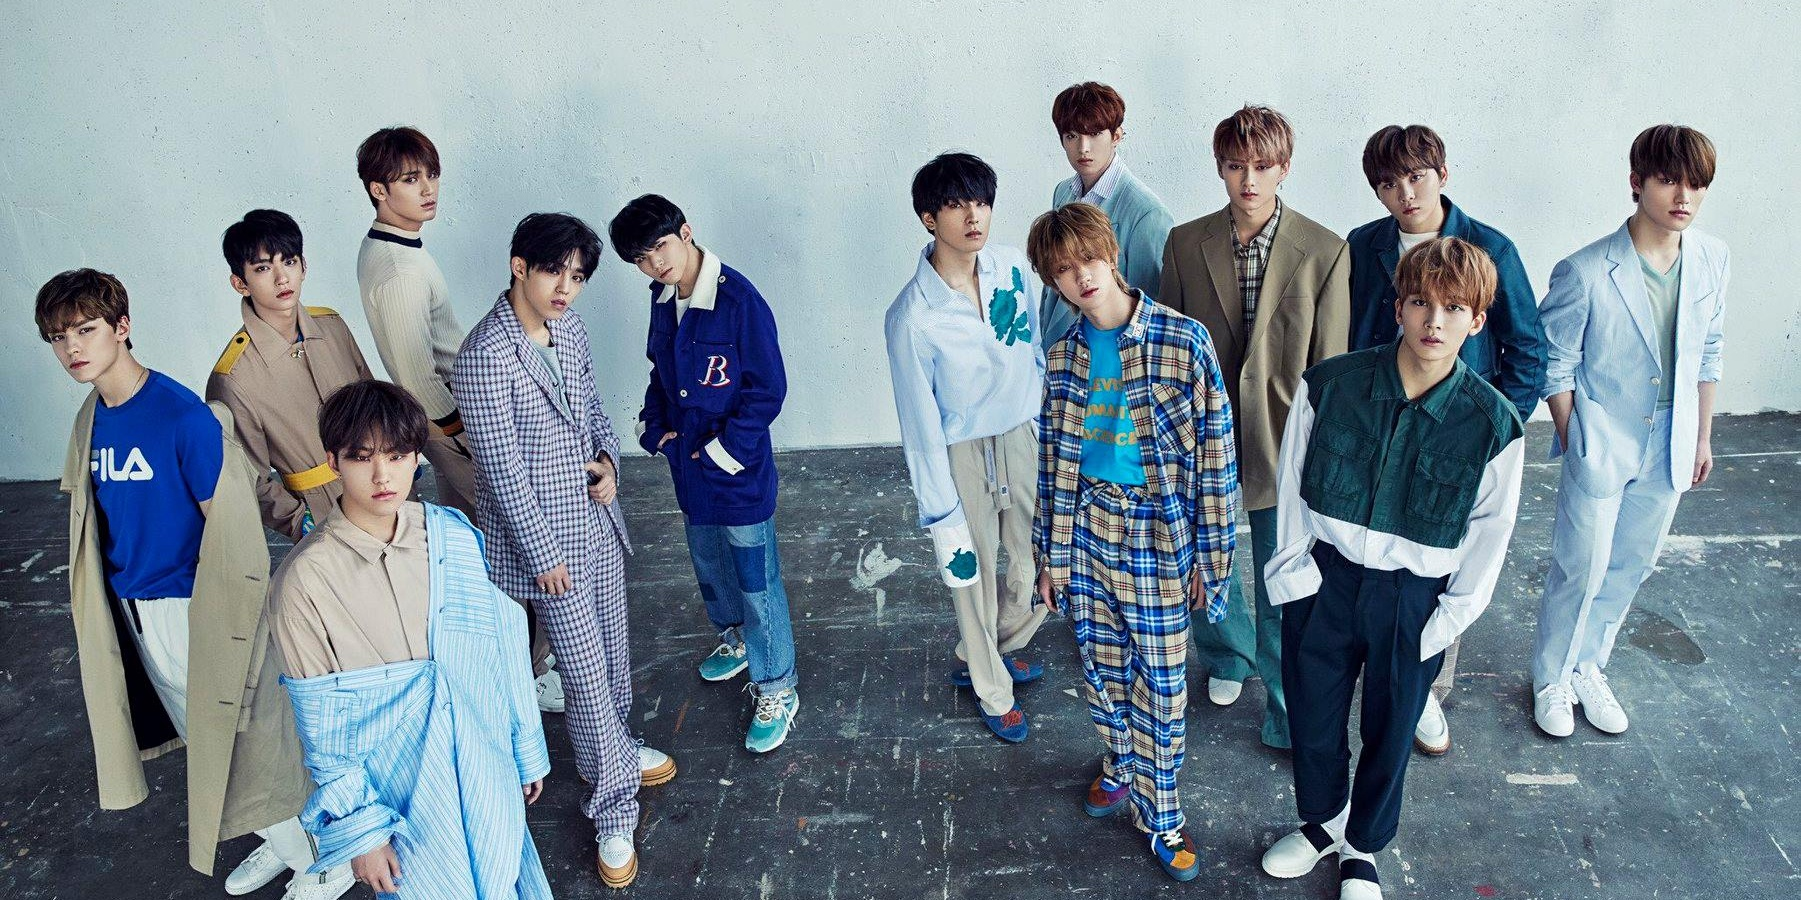 K-pop group SEVENTEEN announce Asia shows, including Singapore, Jakarta, Manila, Kuala Lumpur